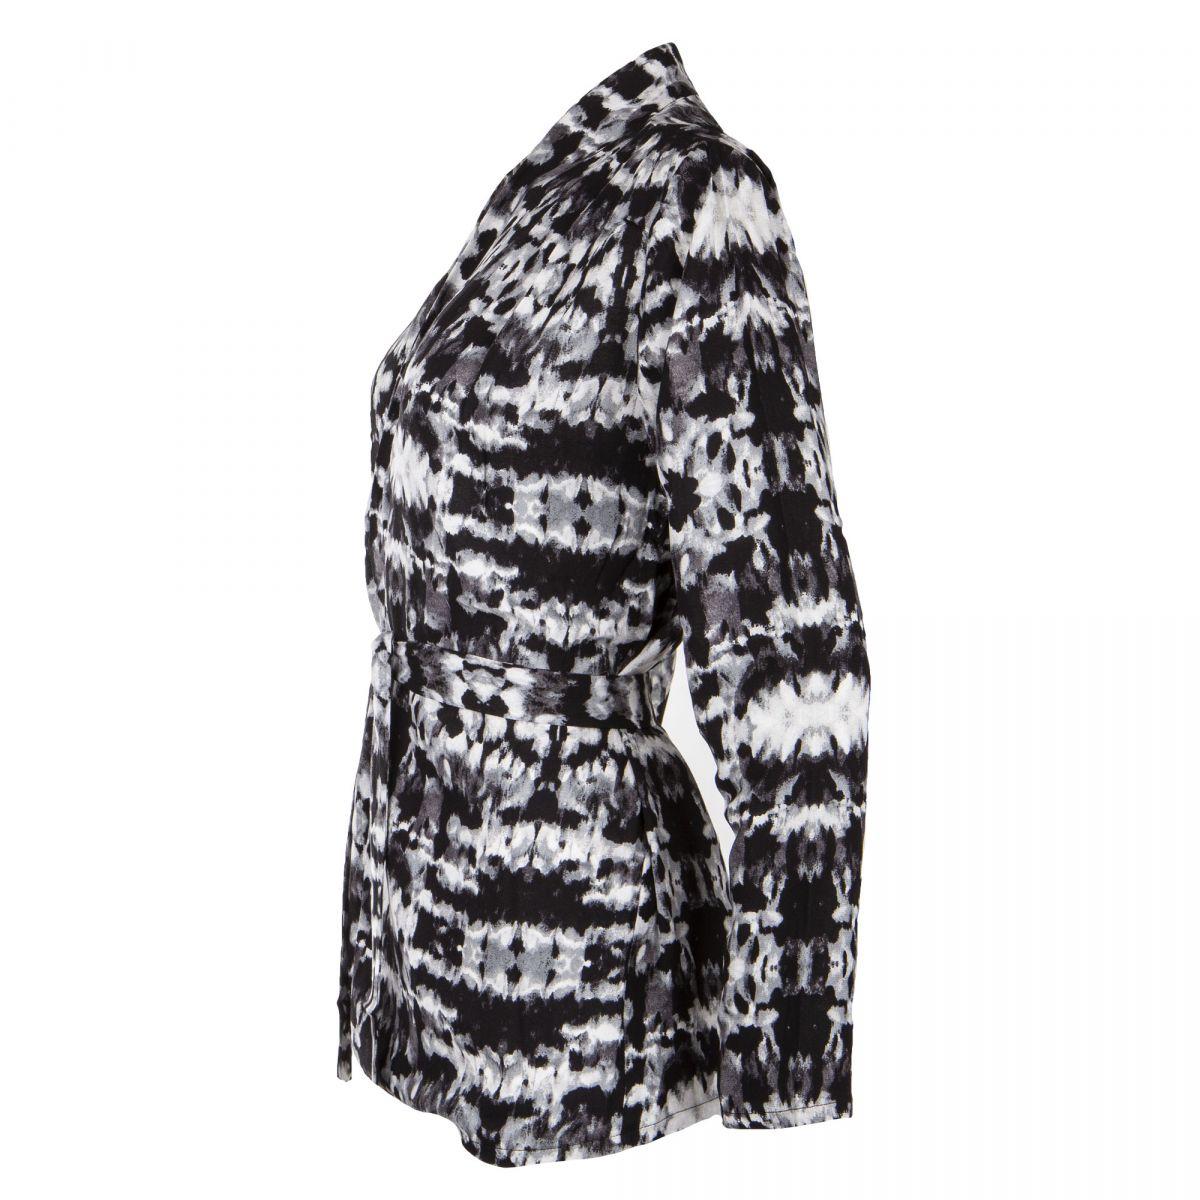 9a2f15ca5c6e62 veste-style-blazer-femme-american-vintage.jpg